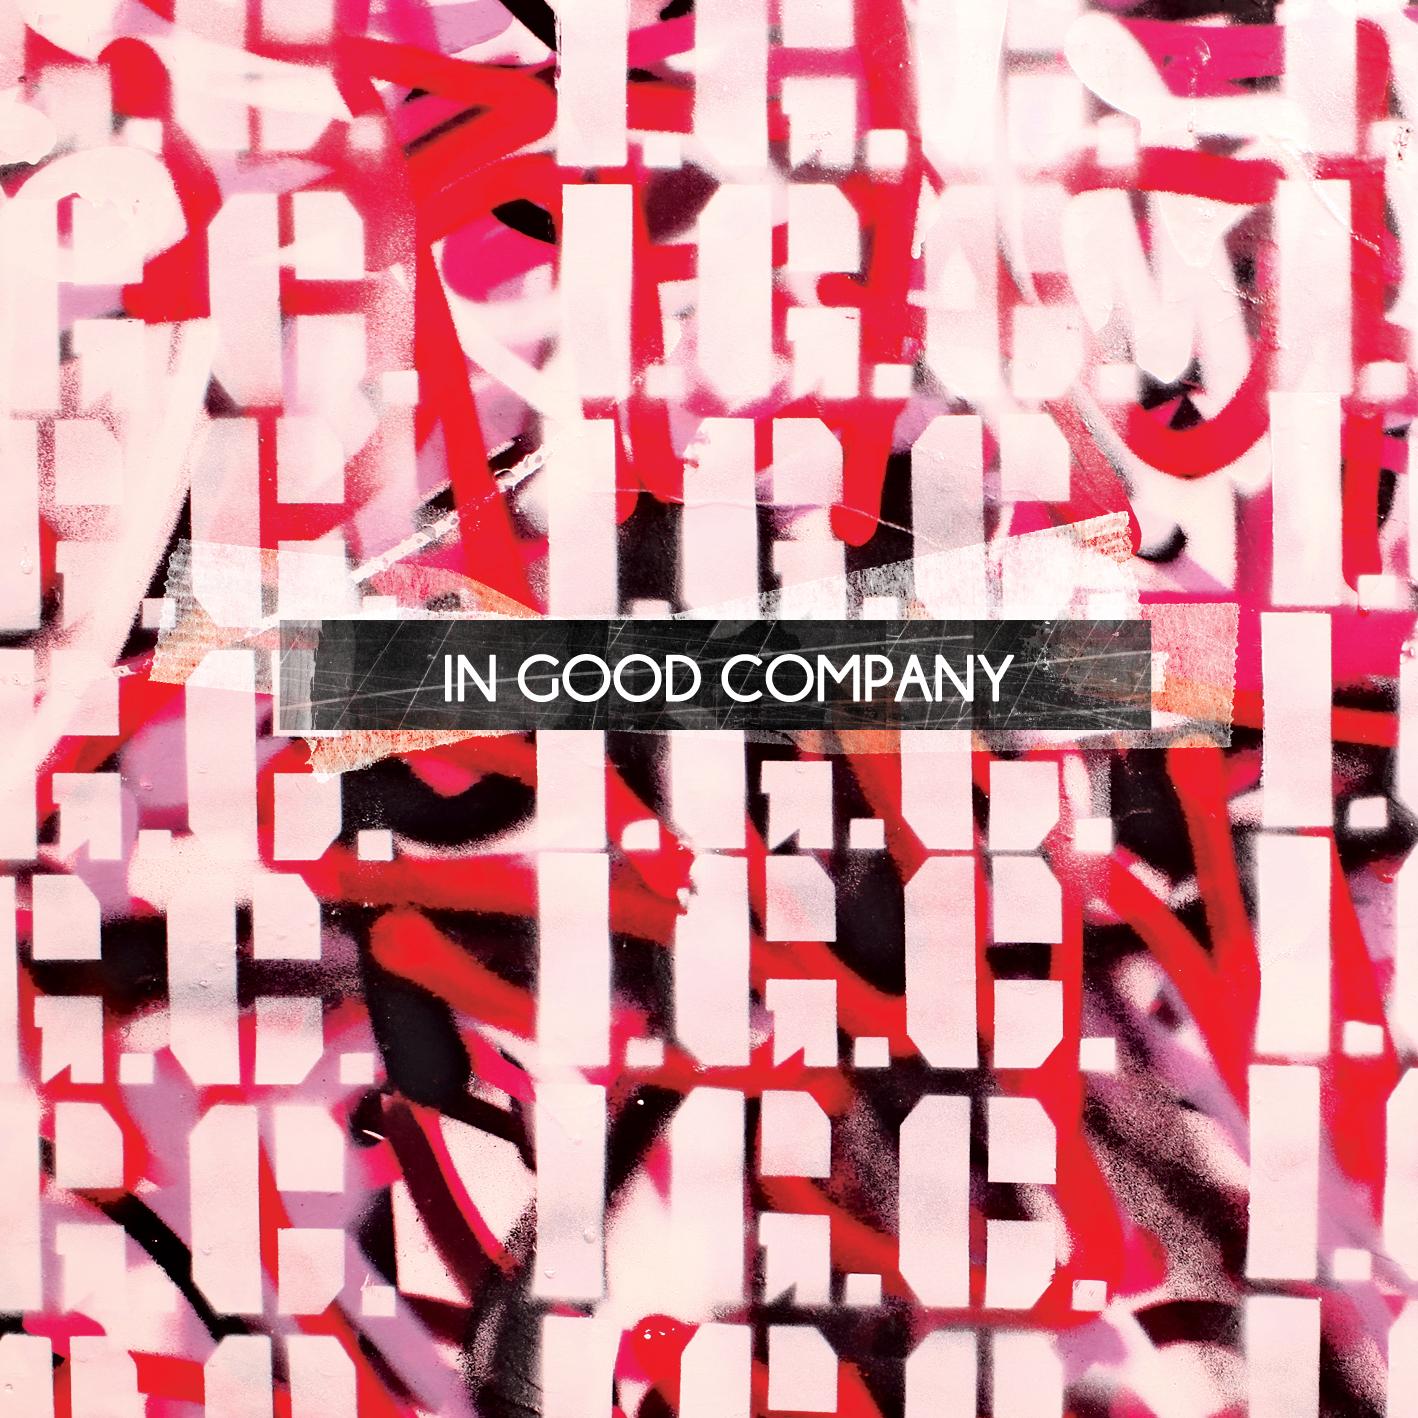 InGoodCompany_HiRes_Cover1.jpg